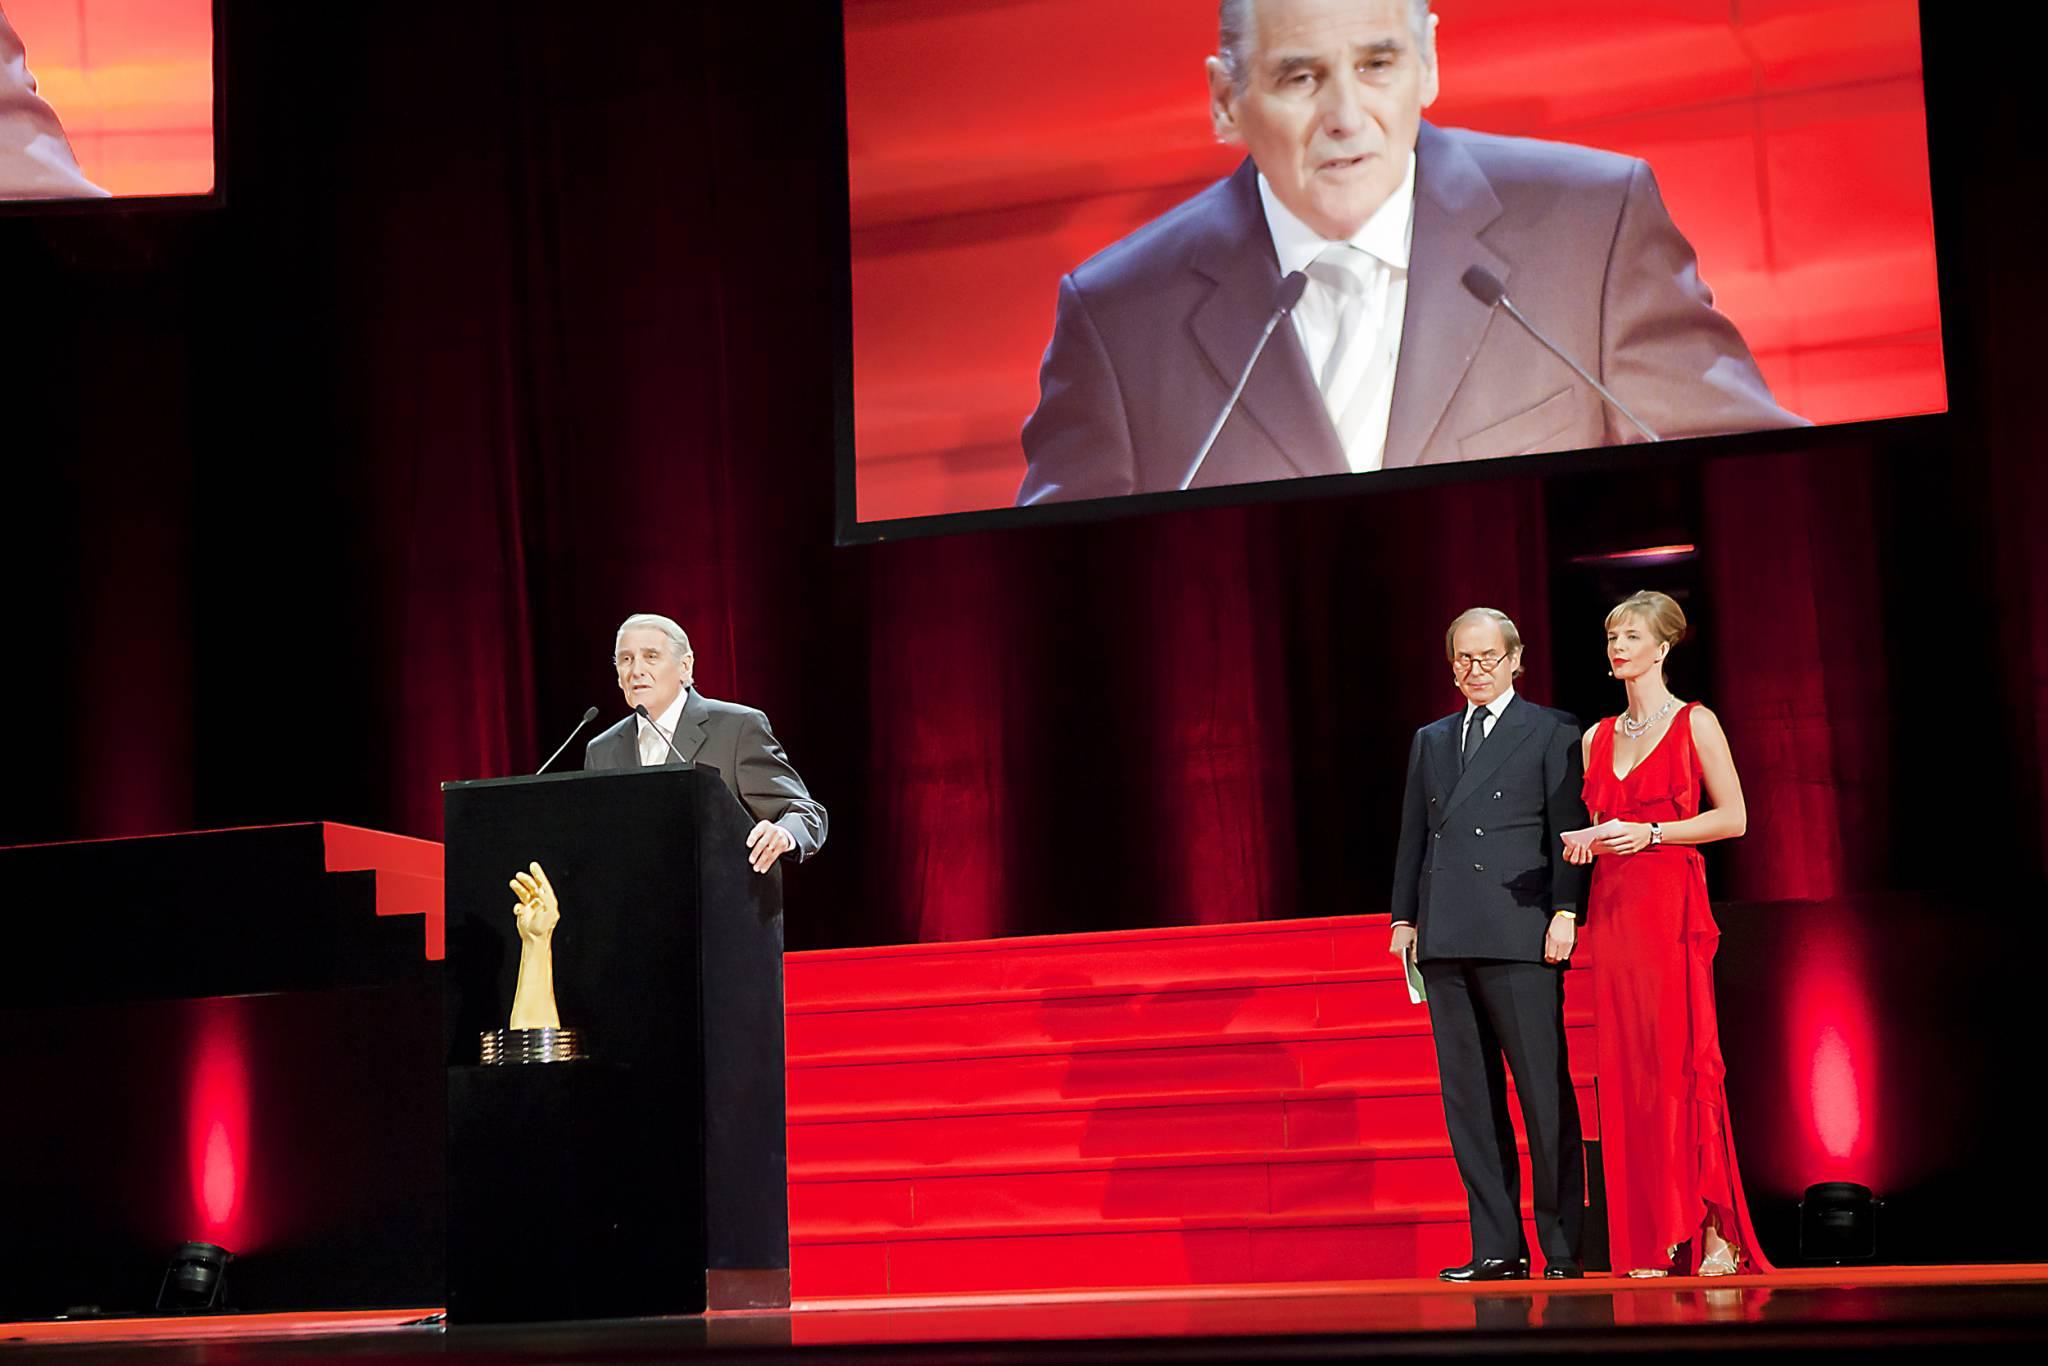 Carlo Lamprecht, President of GPHG and former Geneva State councillor, Simon de Pury and Natacha Wenger, co-hosts of the 2011 GPHG